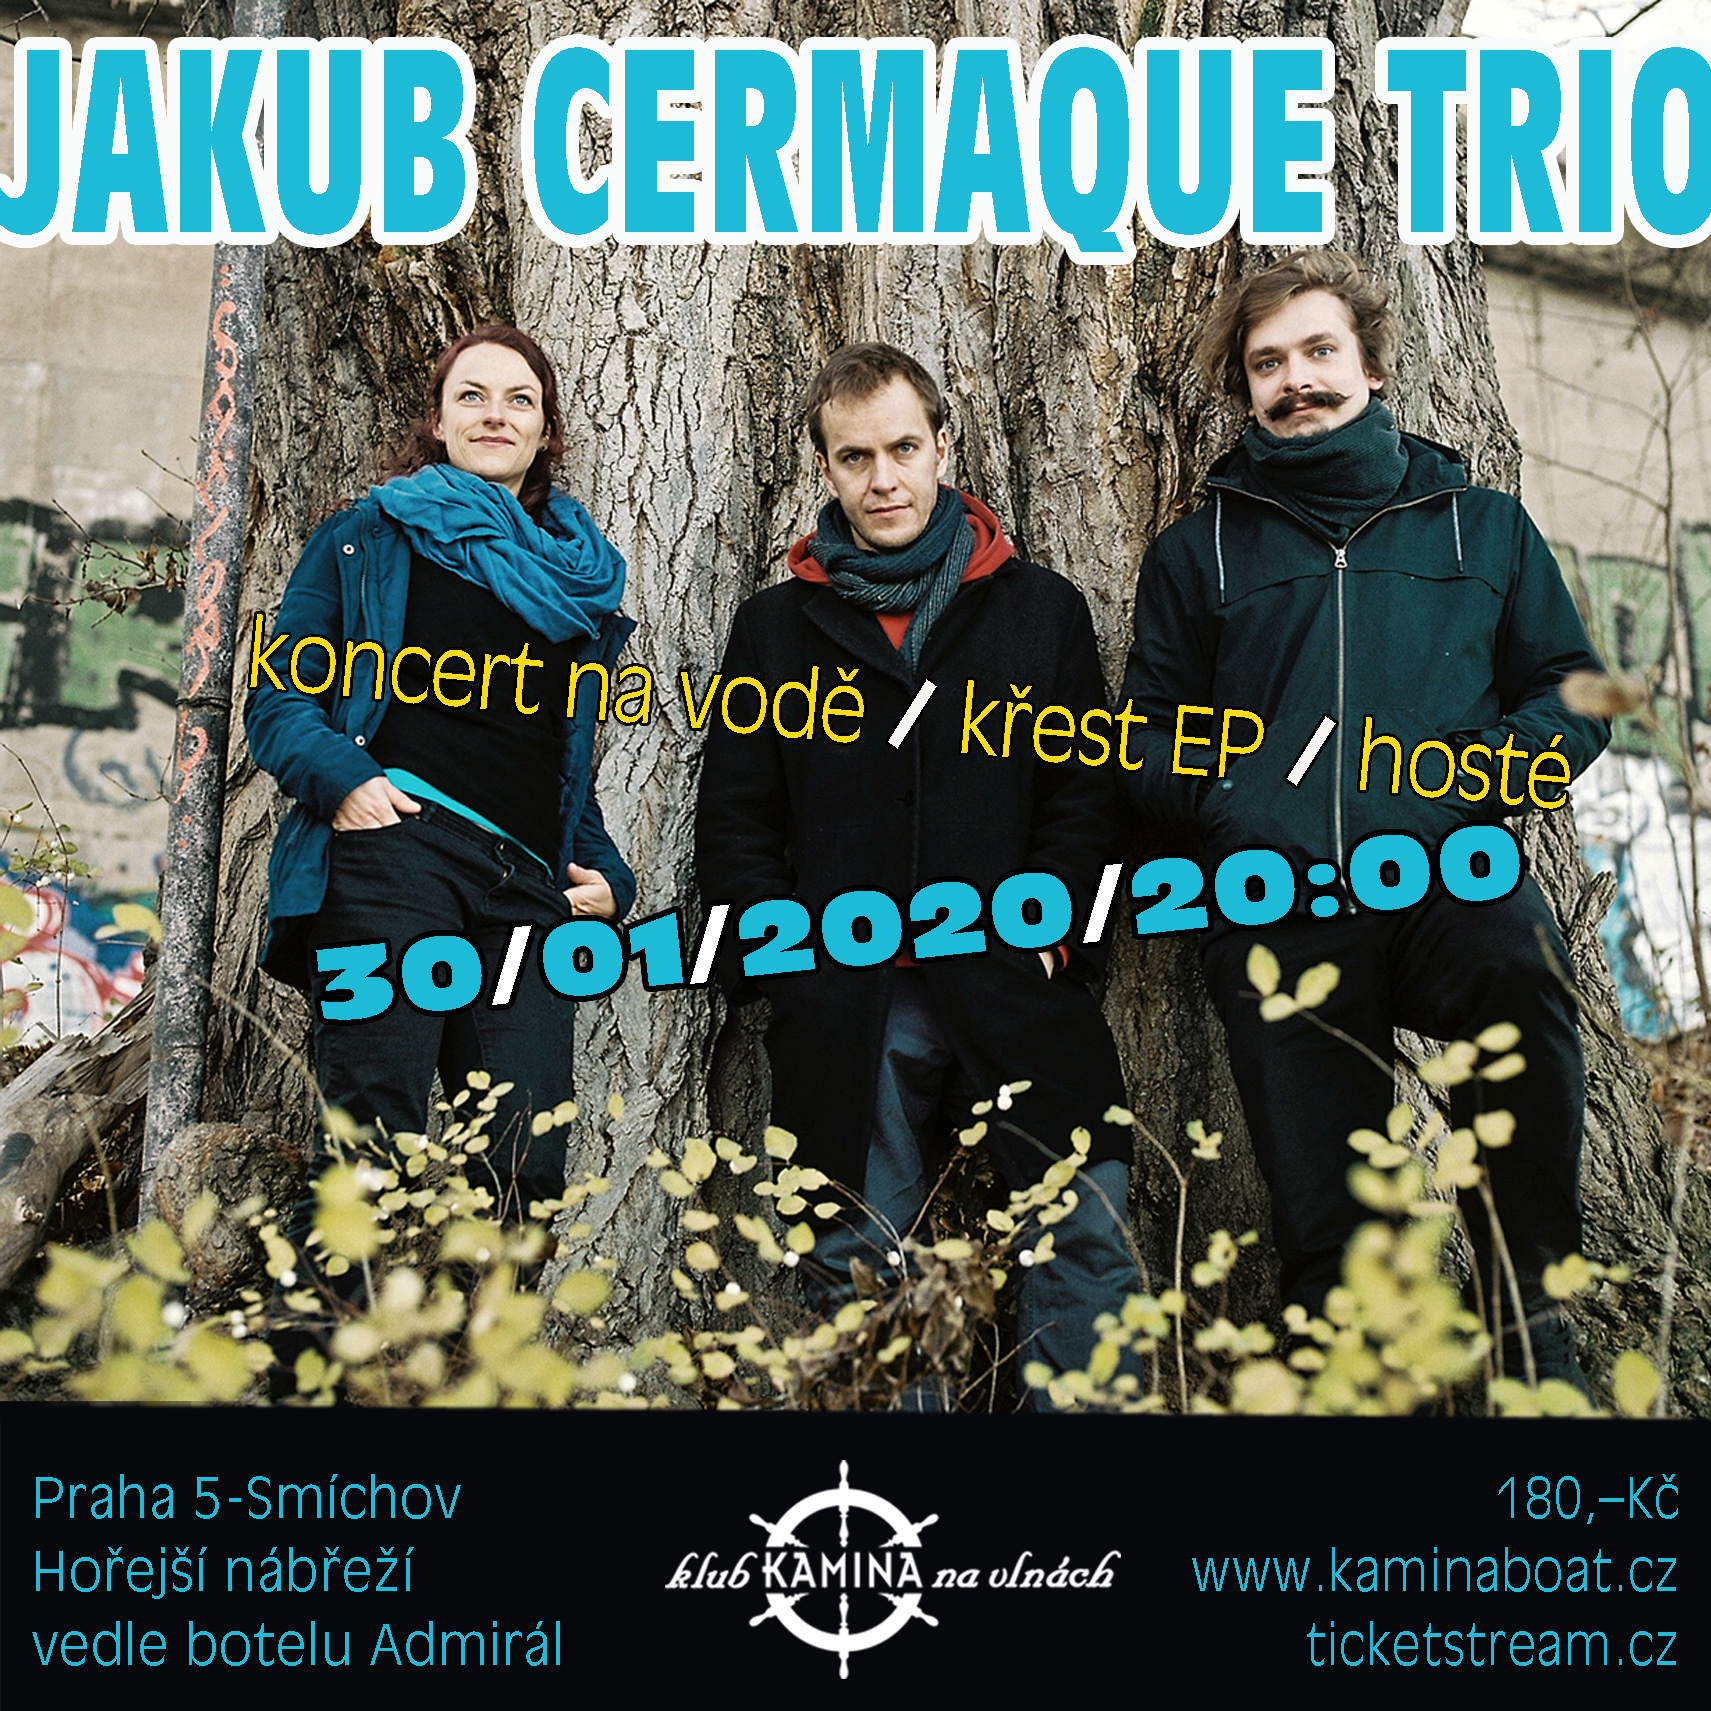 Jakub Cermaque trio